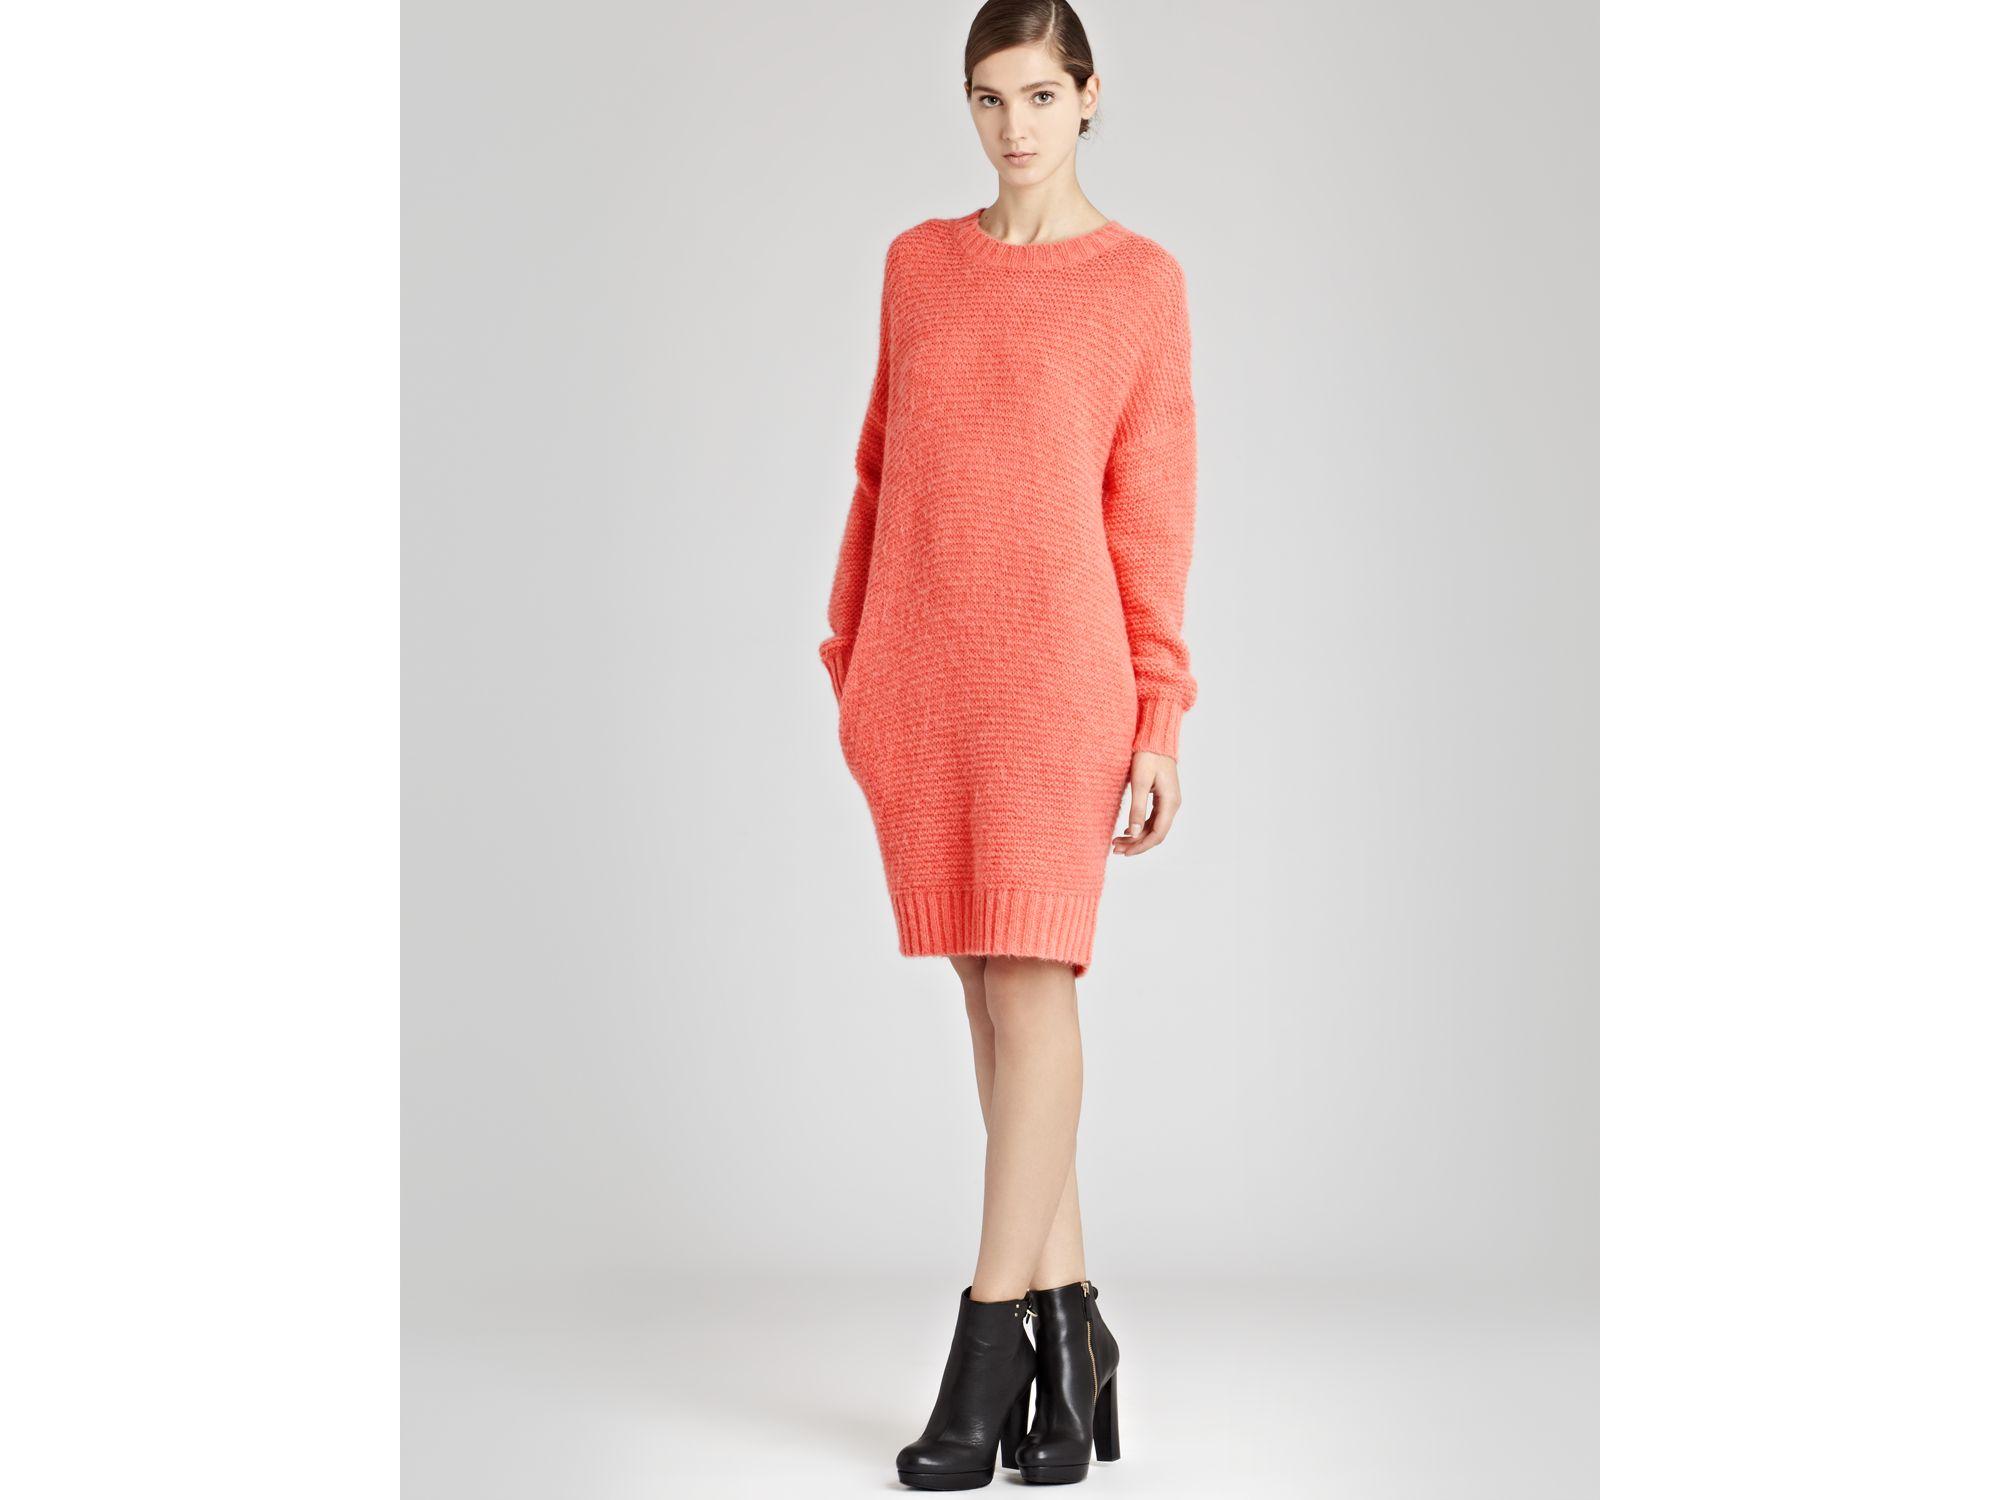 e460dc583b Lyst - Reiss Loose Knit Dress in Pink